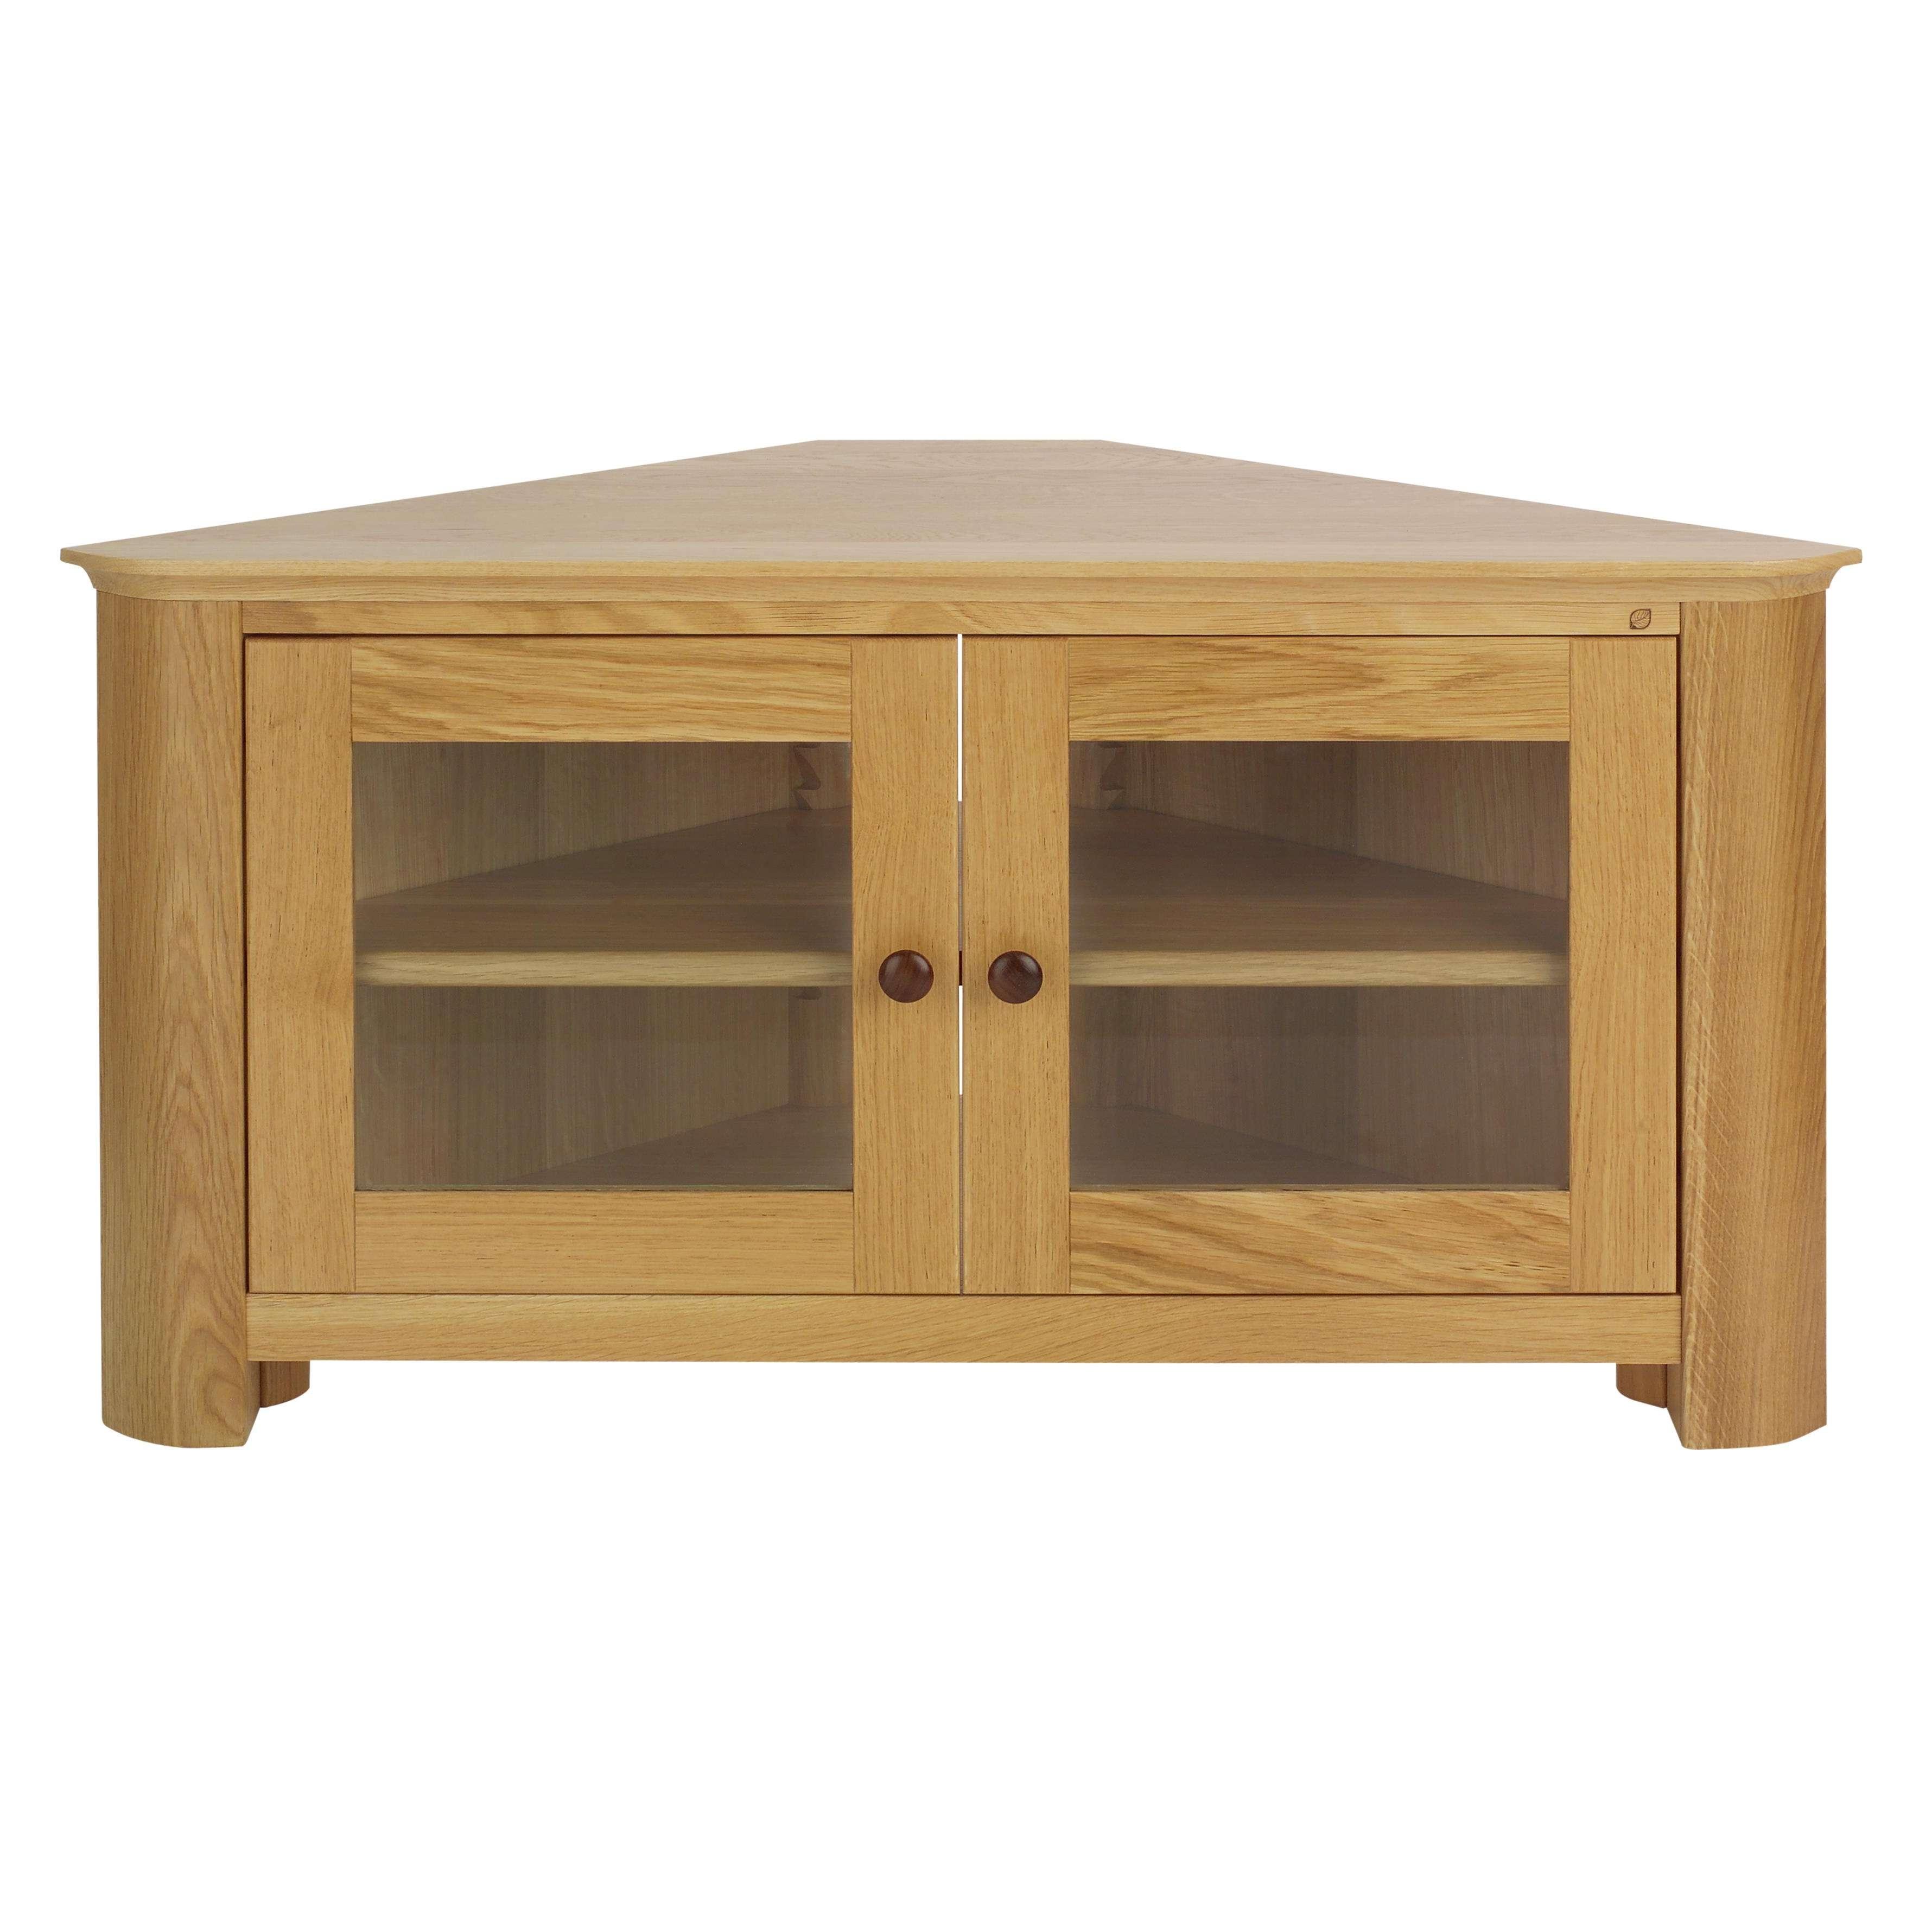 Uncategorized: Best Corner Tv Stand Ikea Ikea Tv Stand Hemnes, Tv In Small Corner Tv Cabinets (View 18 of 20)